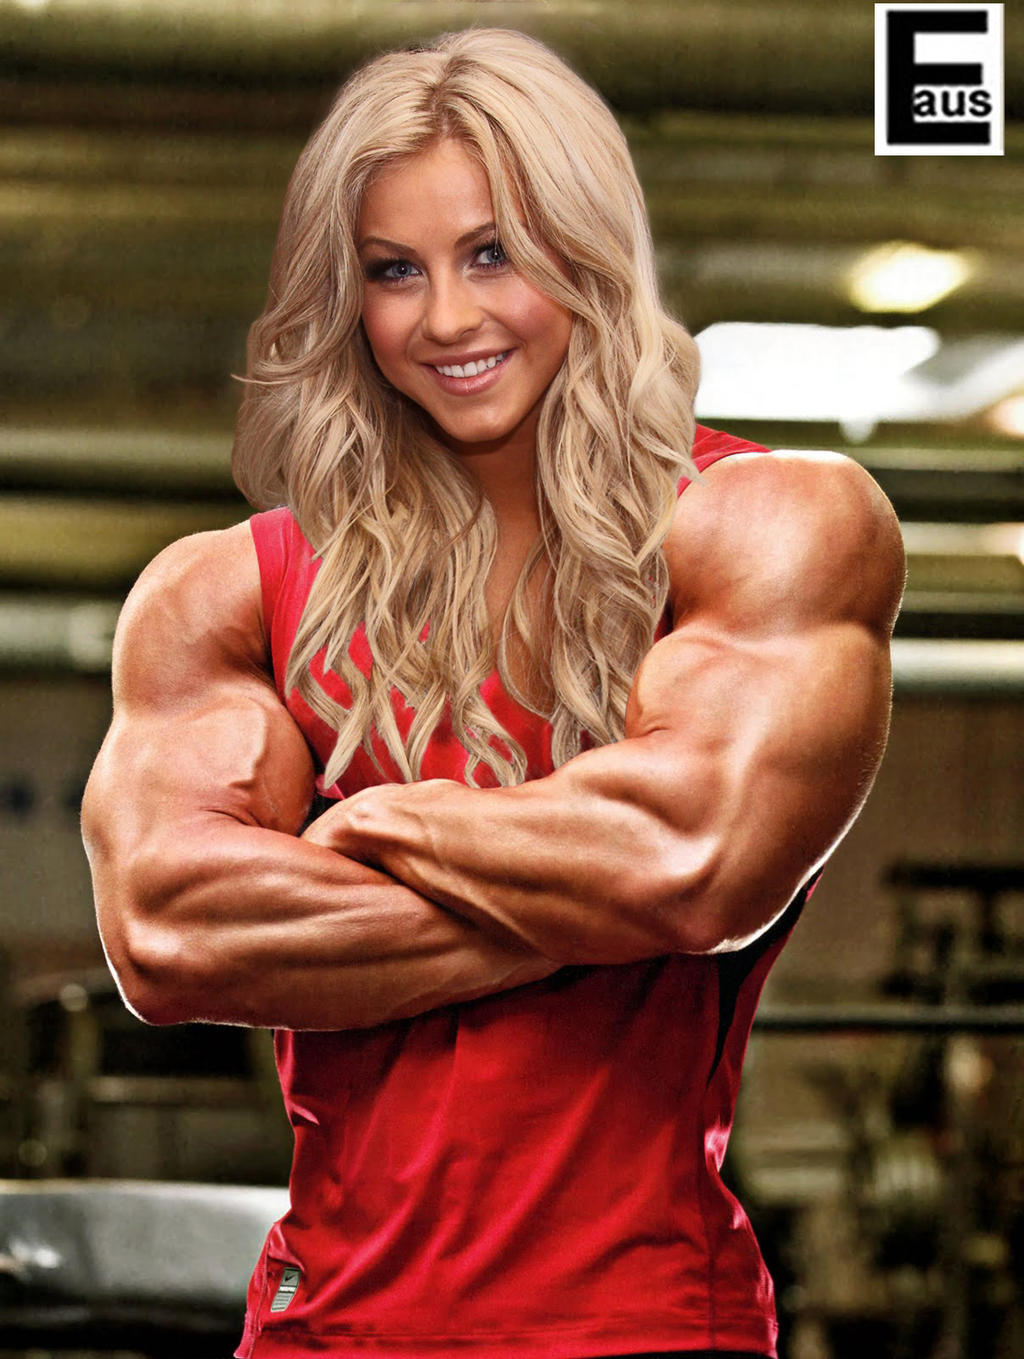 Mature Women Bodybuilder 54